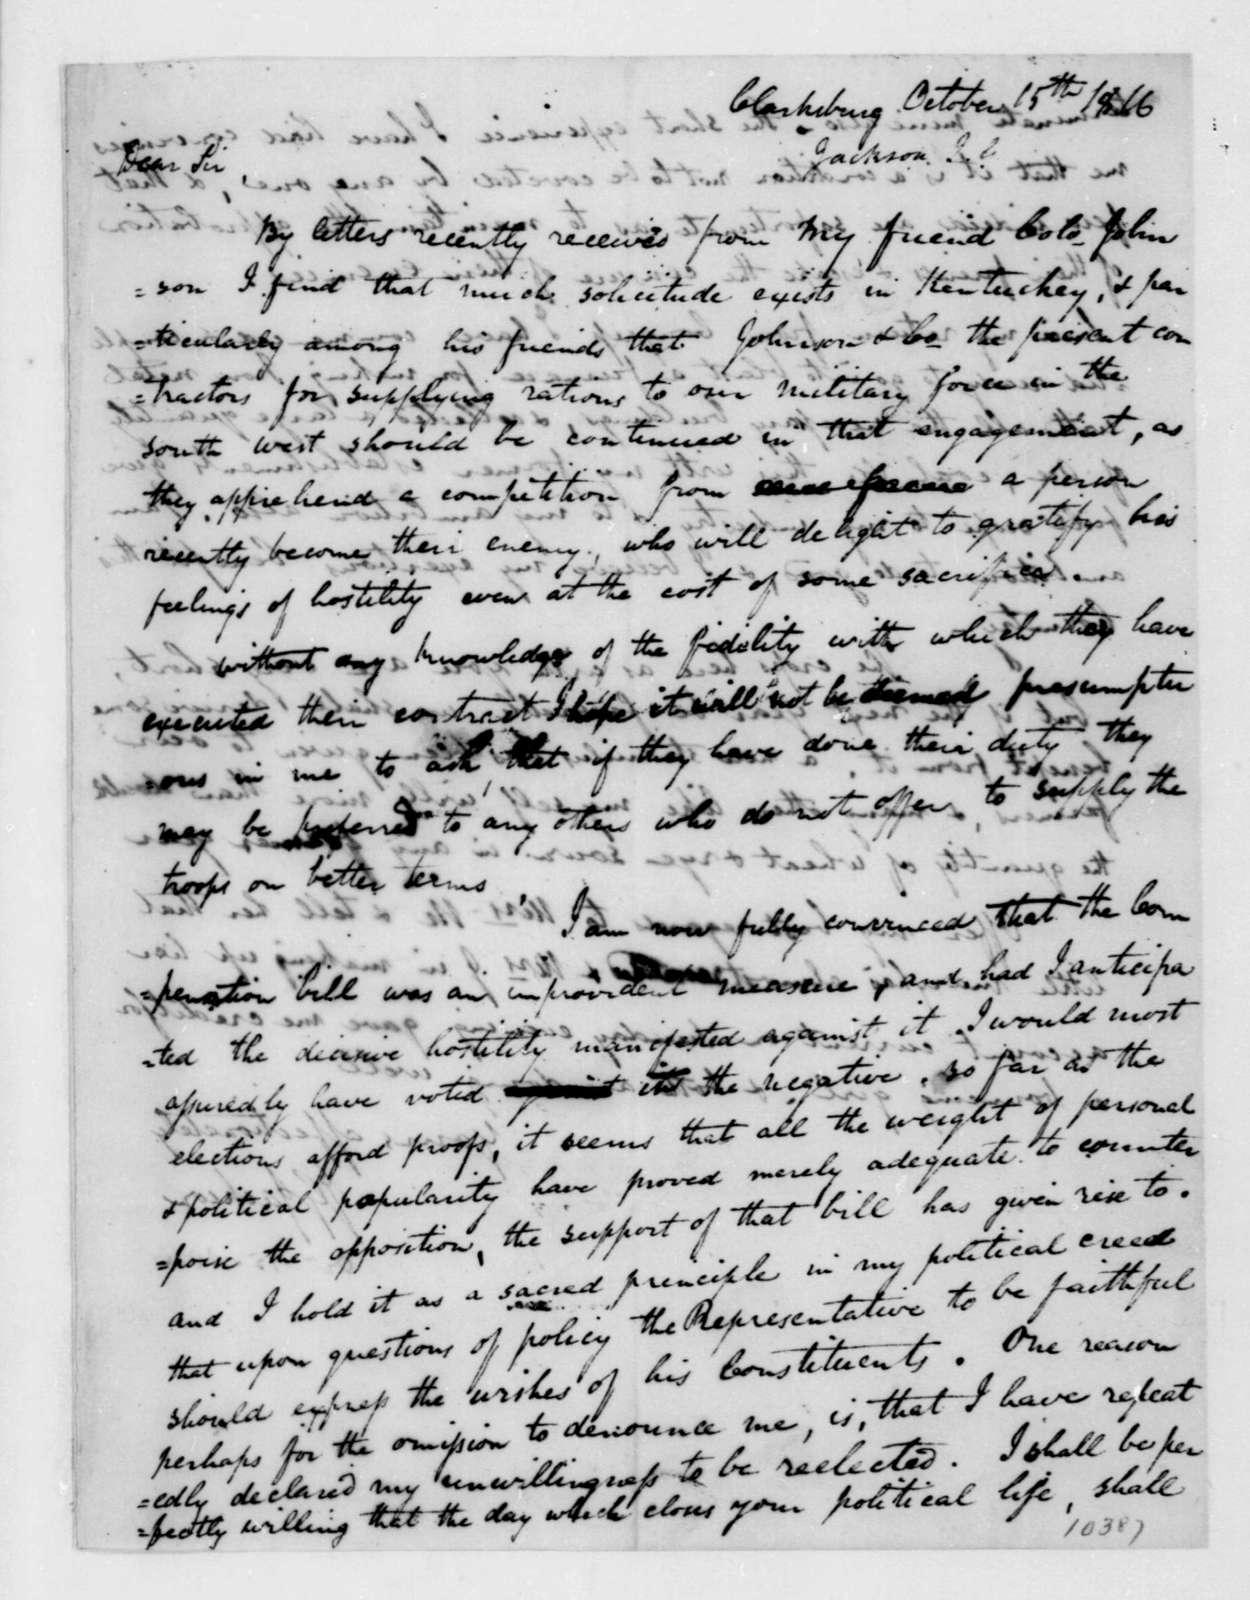 John G. Jackson to James Madison, October 15, 1816.